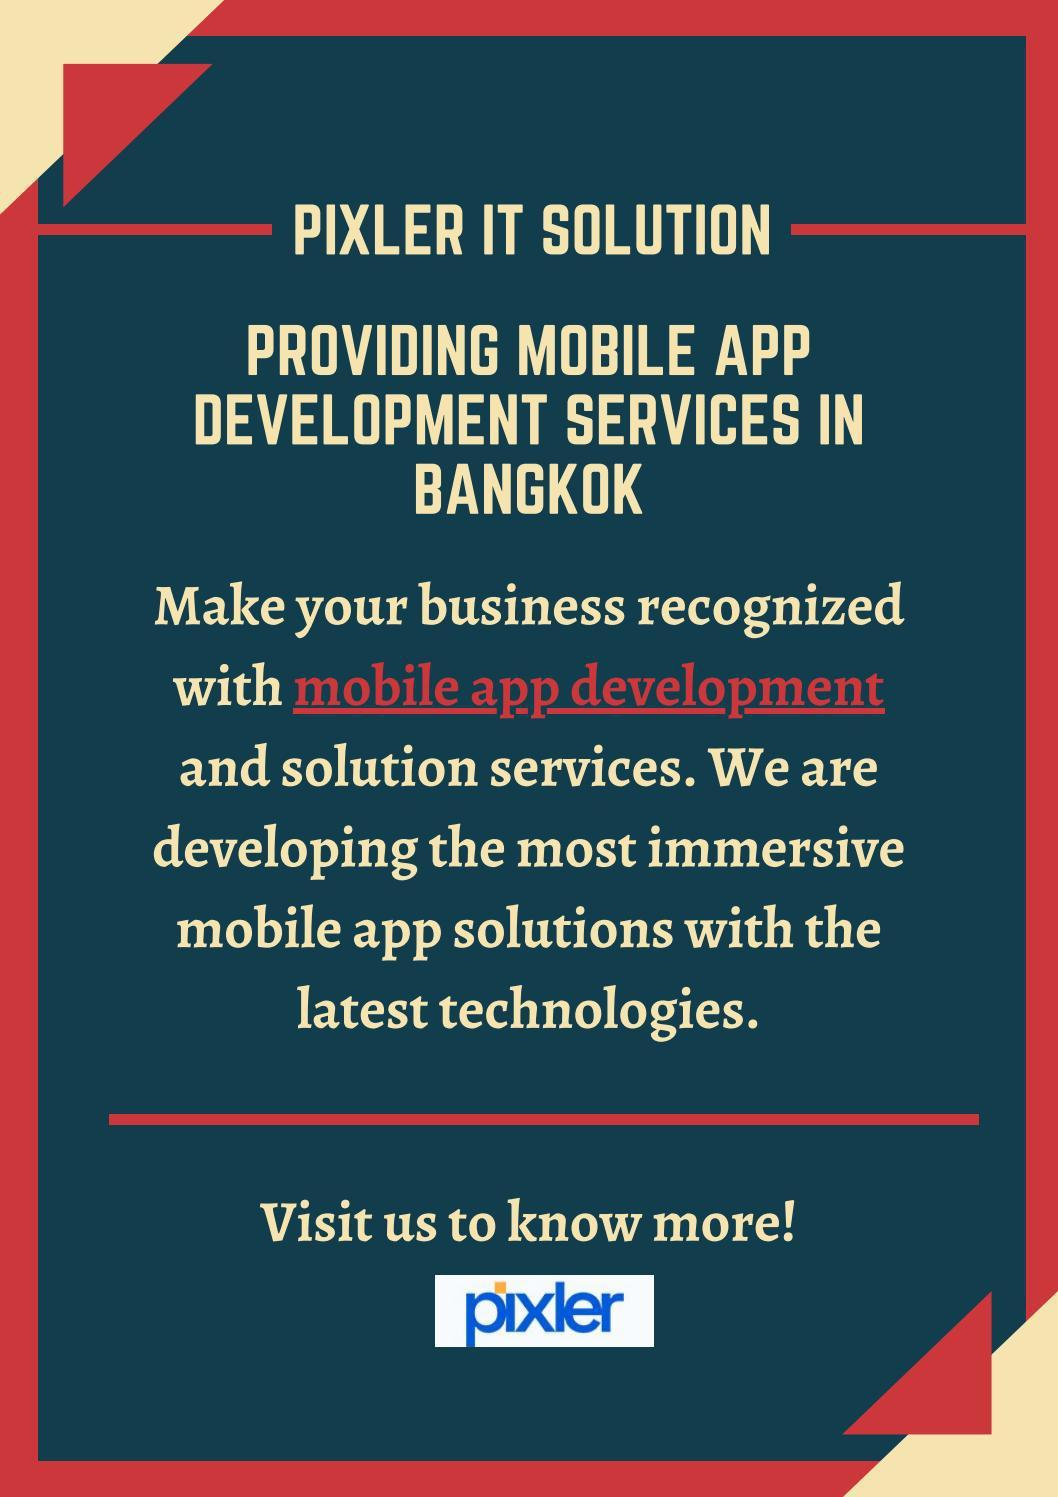 Providing Mobile App Development Services in Bangkok